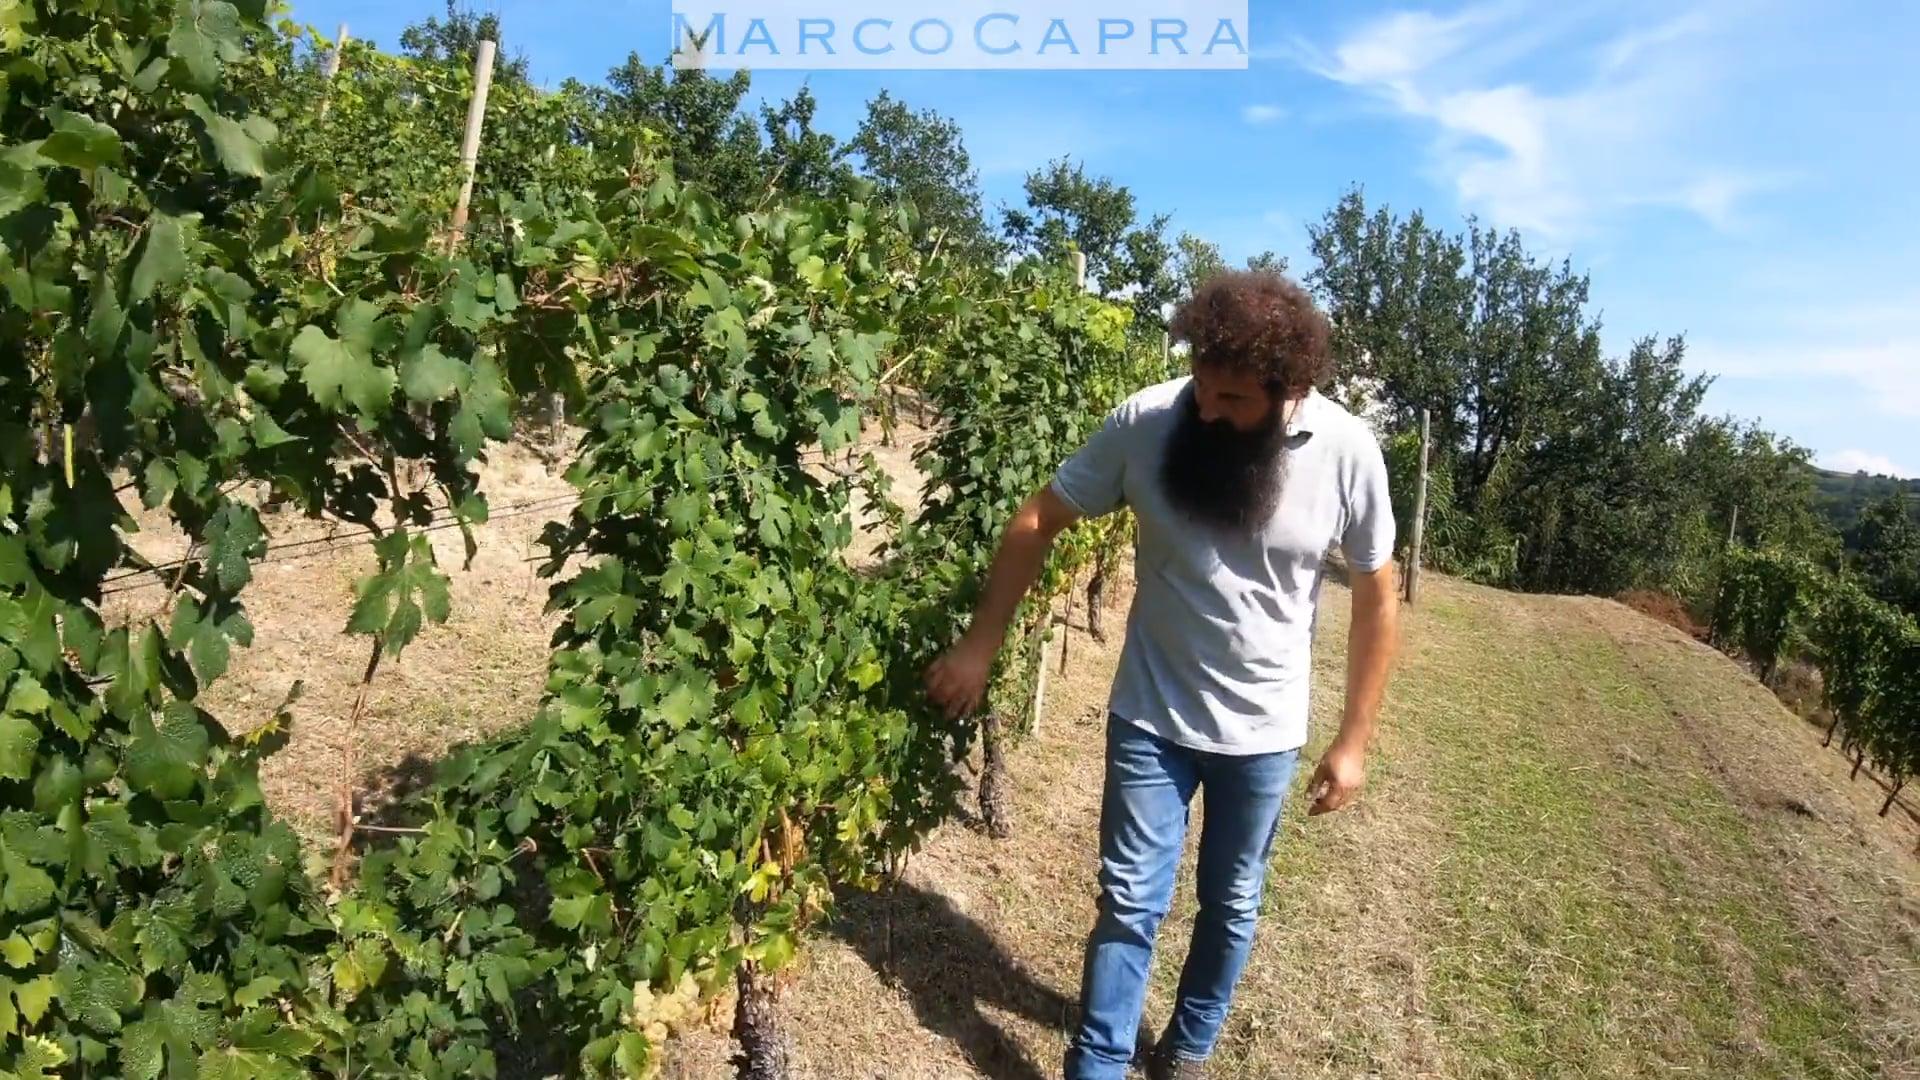 Marco Capra | Il vigneto di Santo Stefano Belbo | The vineyard in Santo Stefano Belbo